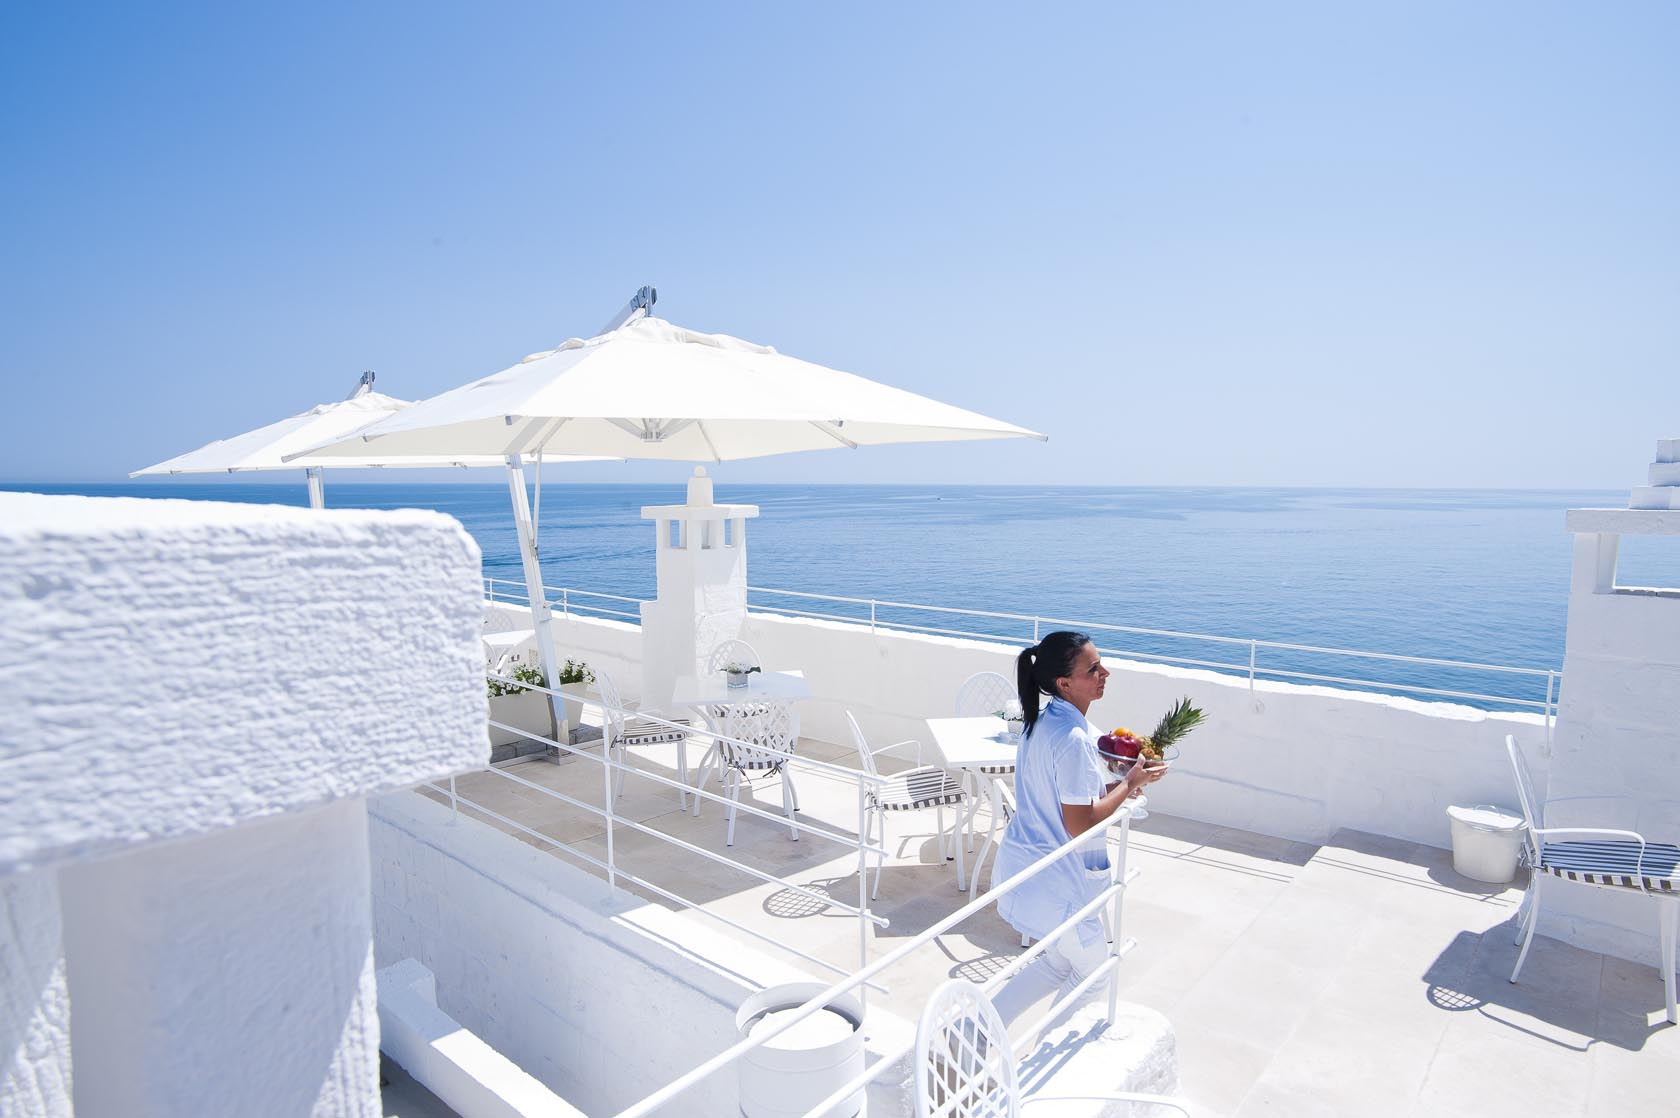 rooftop-view-adriatic-don-ferrante